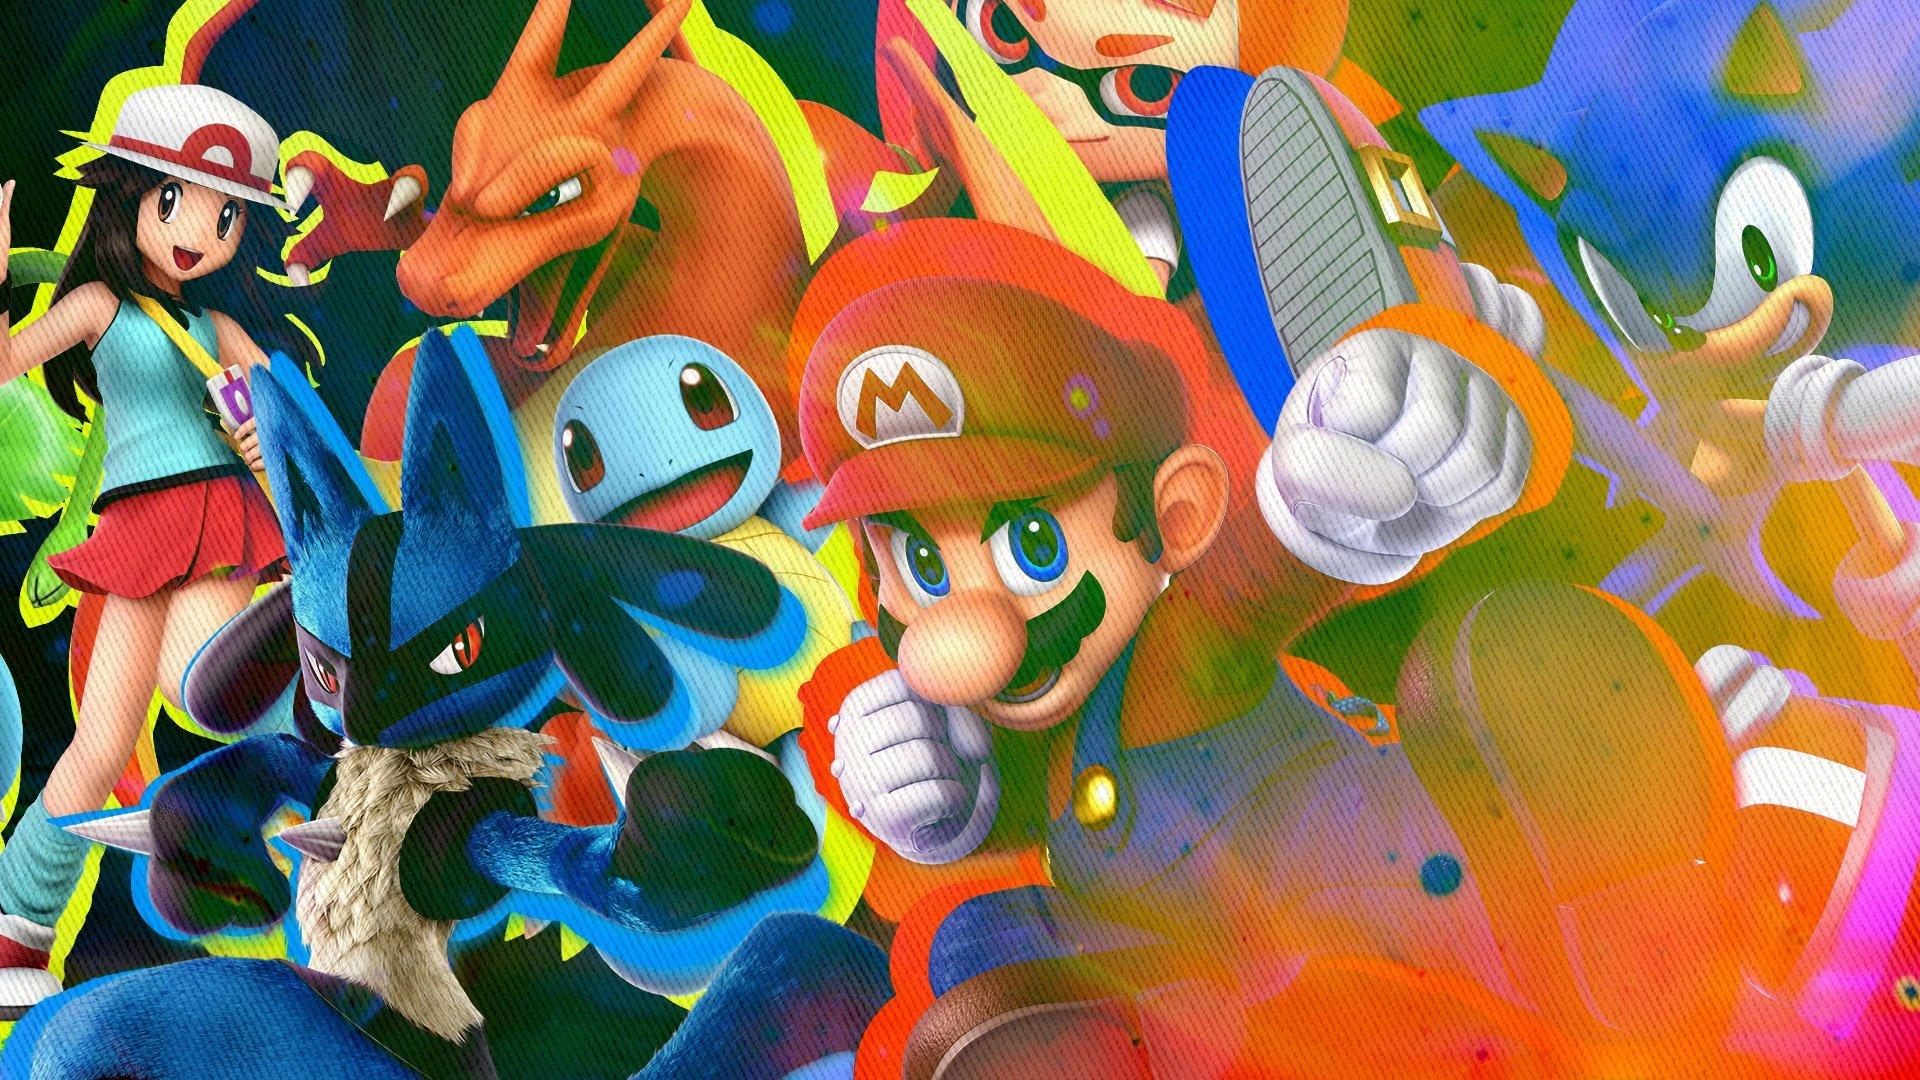 SuperParent's Super Smash Bros Ultimate Tier List | SuperParent